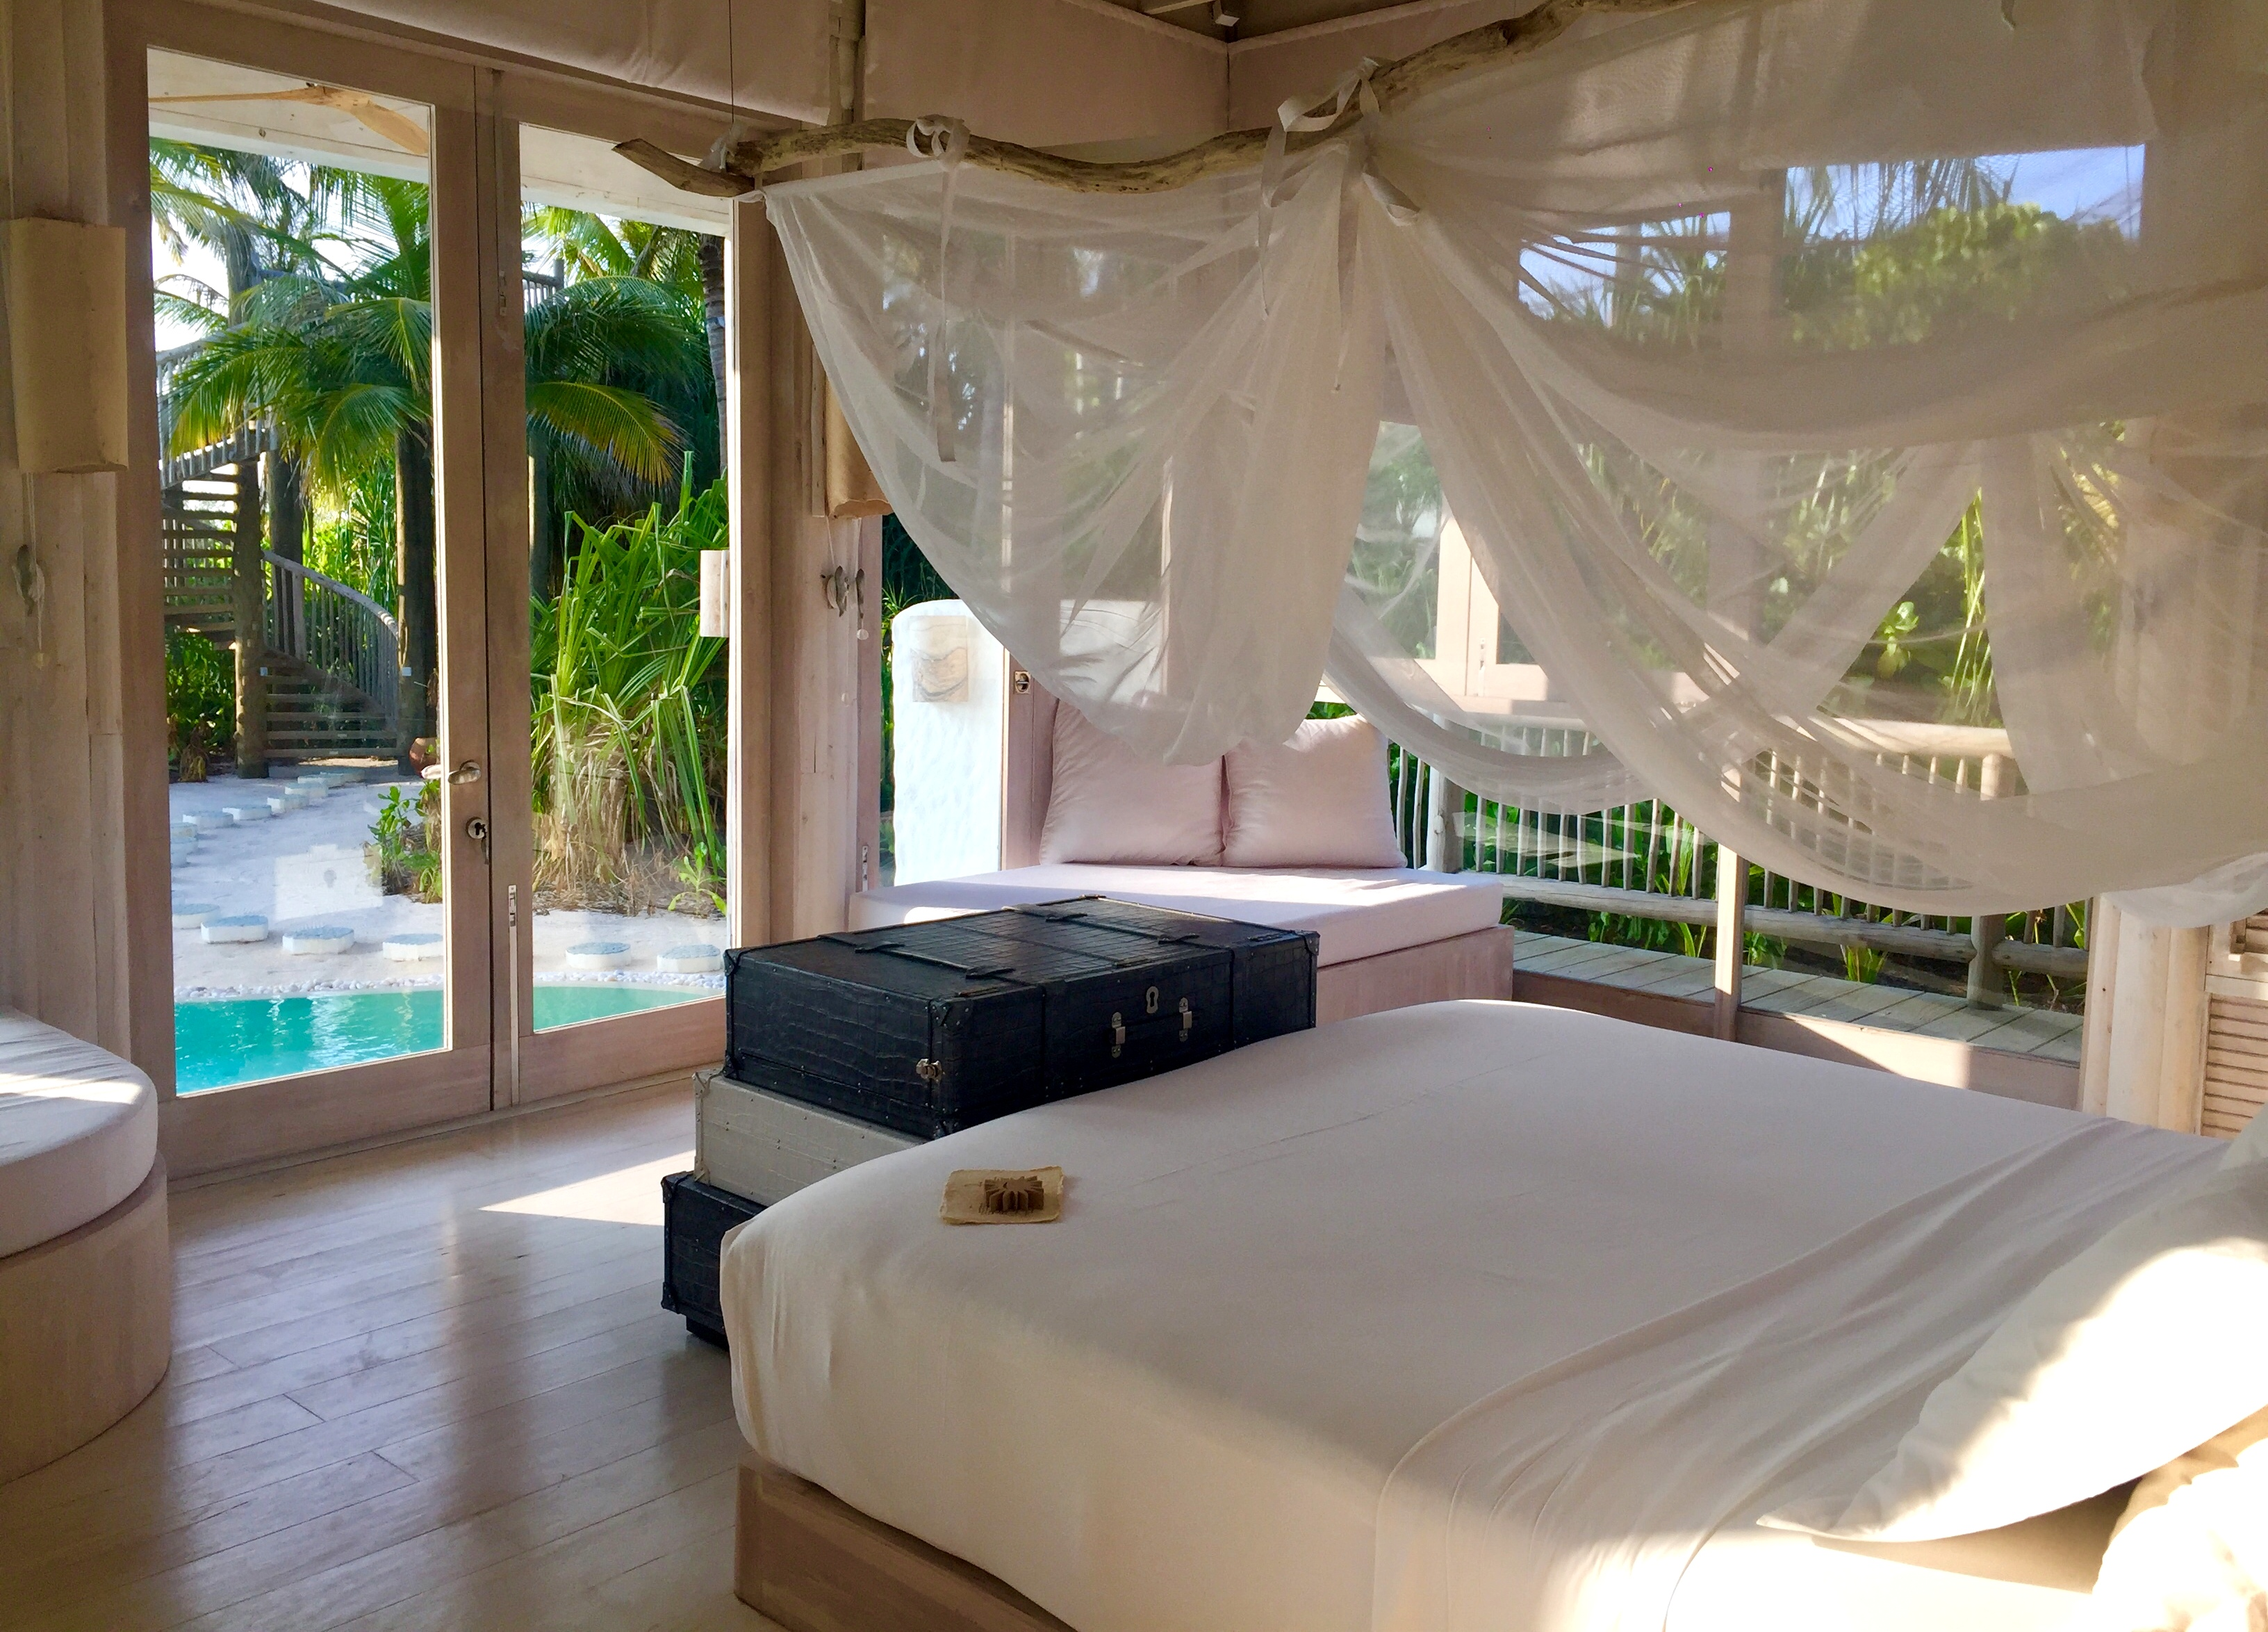 Zu Gast im neuen Soneva Jani Resort auf den Malediven strand sonne reisebericht new malediven honeymoon 2  TUI Berlin Reisebüro Malediven Soneva Jani Beachvilla Schlafzimmer